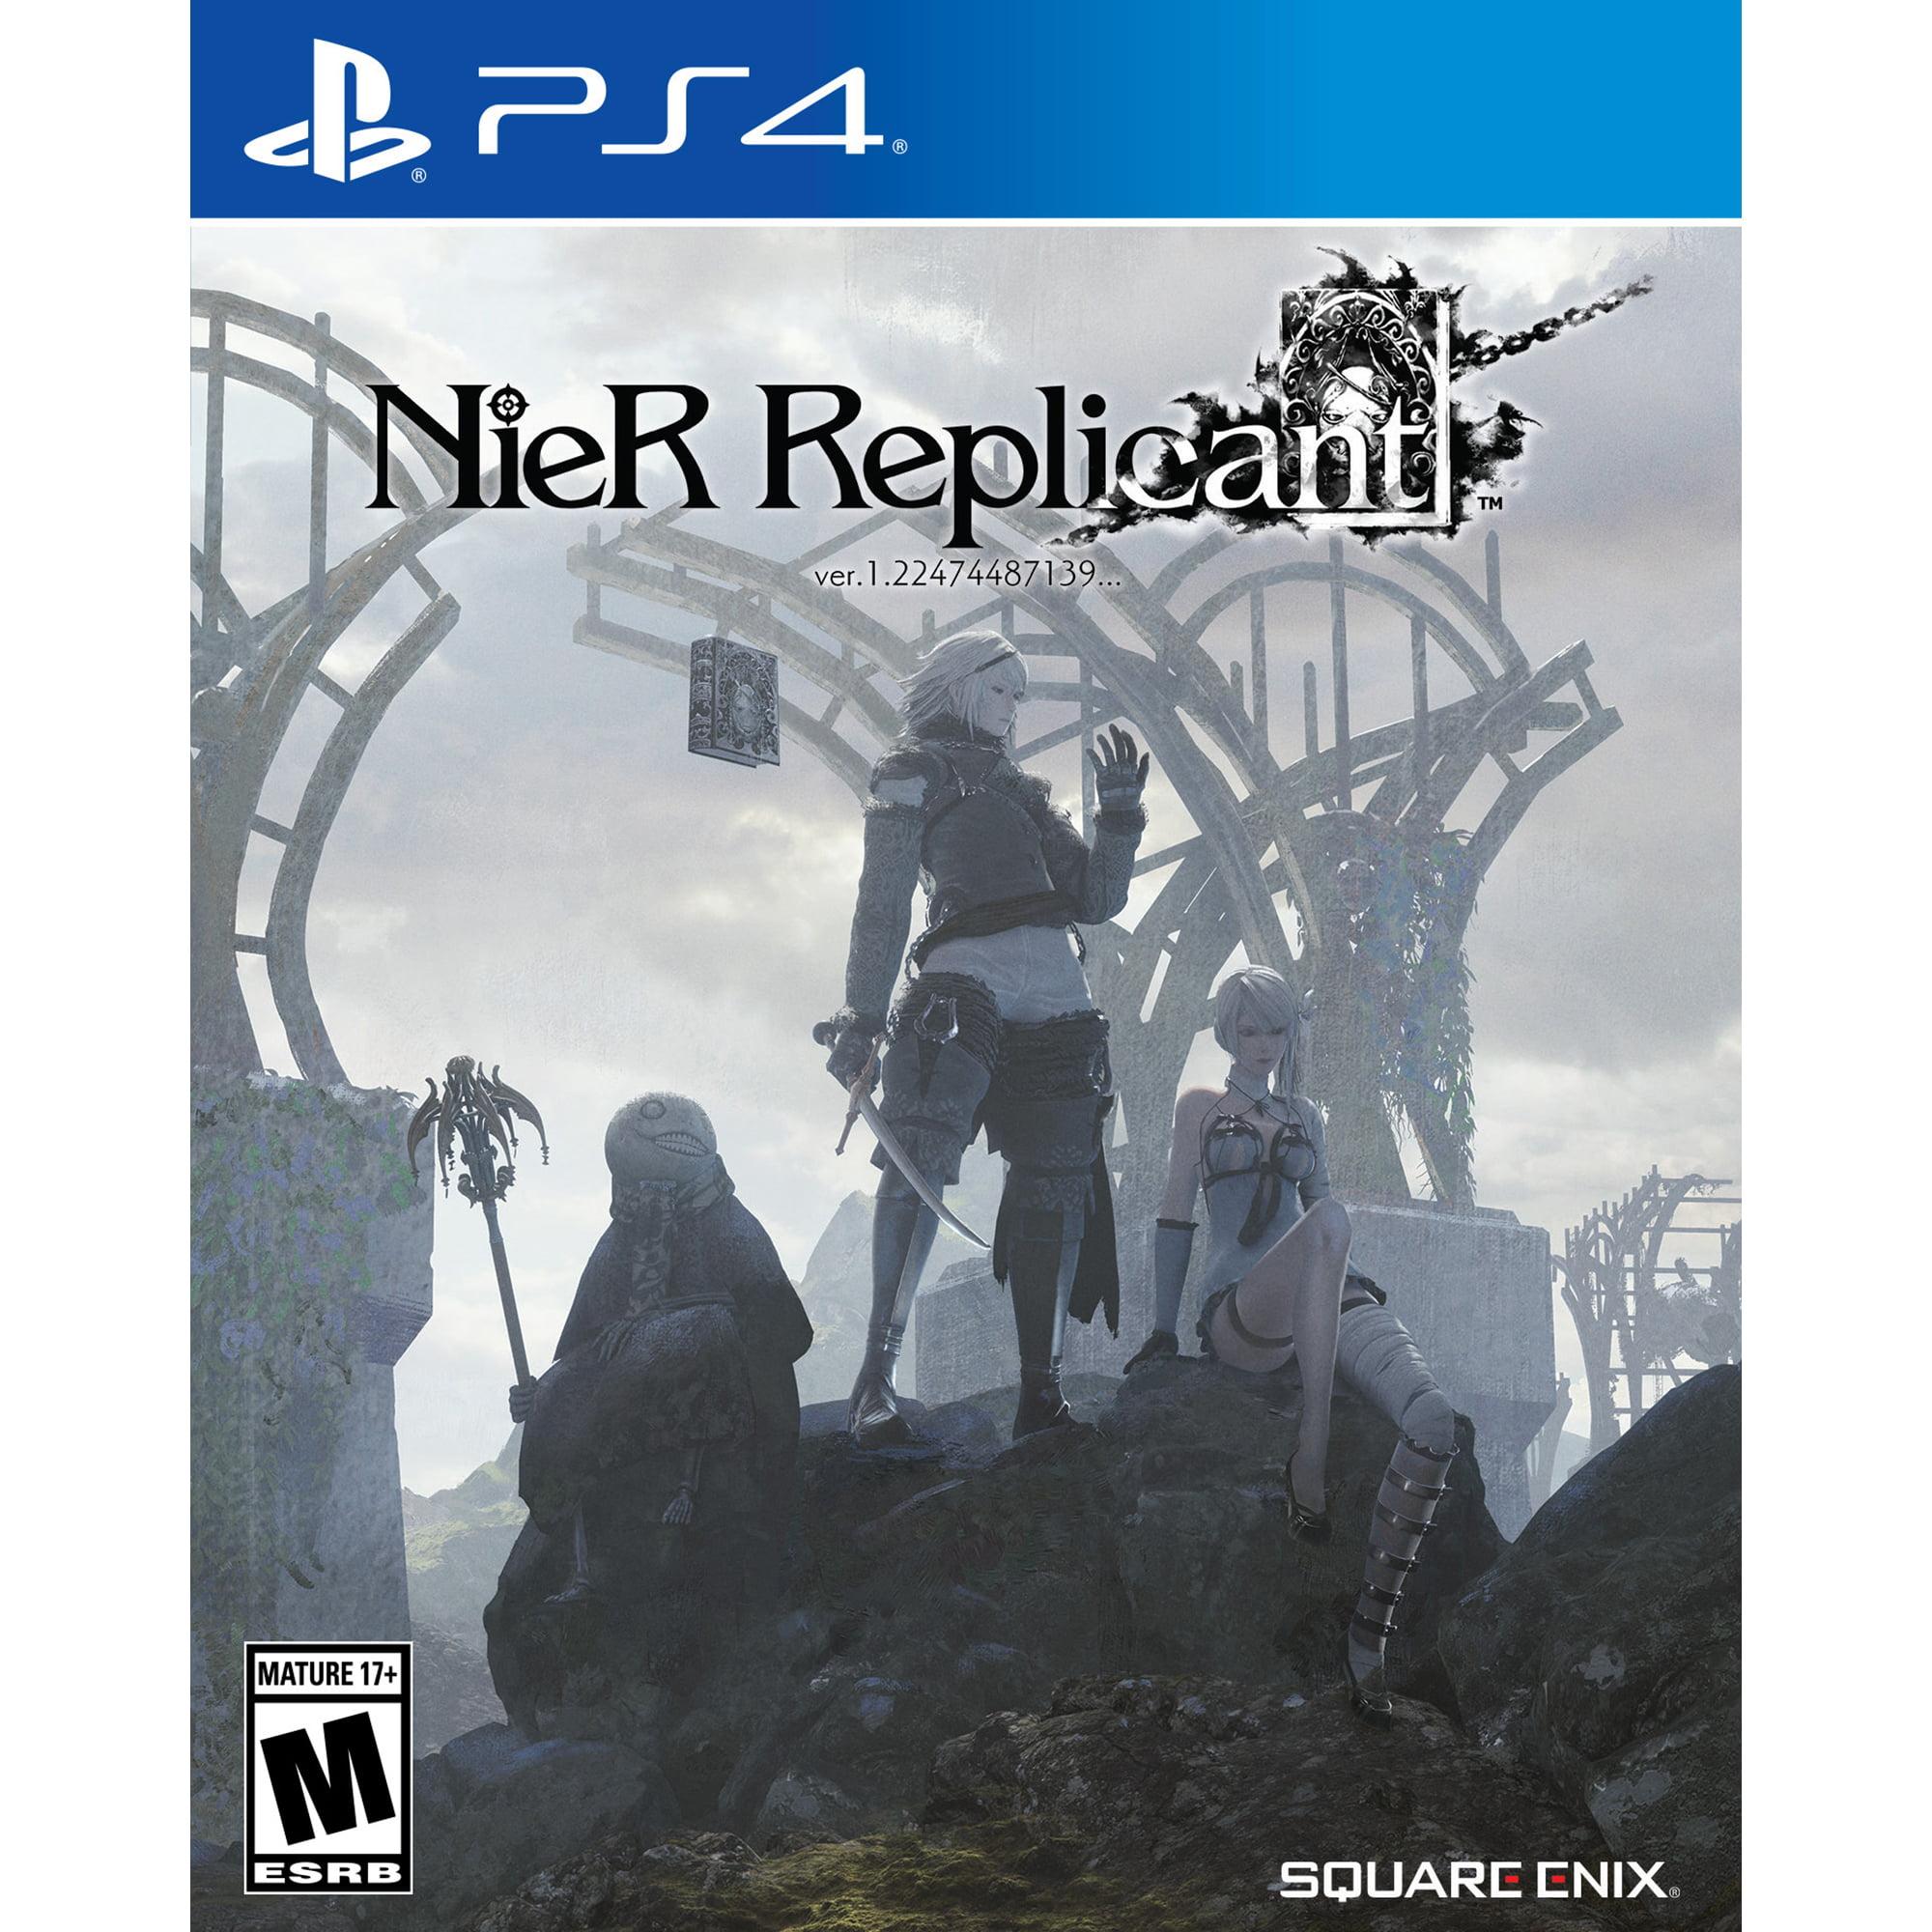 NieR Replicant ver.1.22474487139…, Square Enix, PlayStation 4, 662248924403